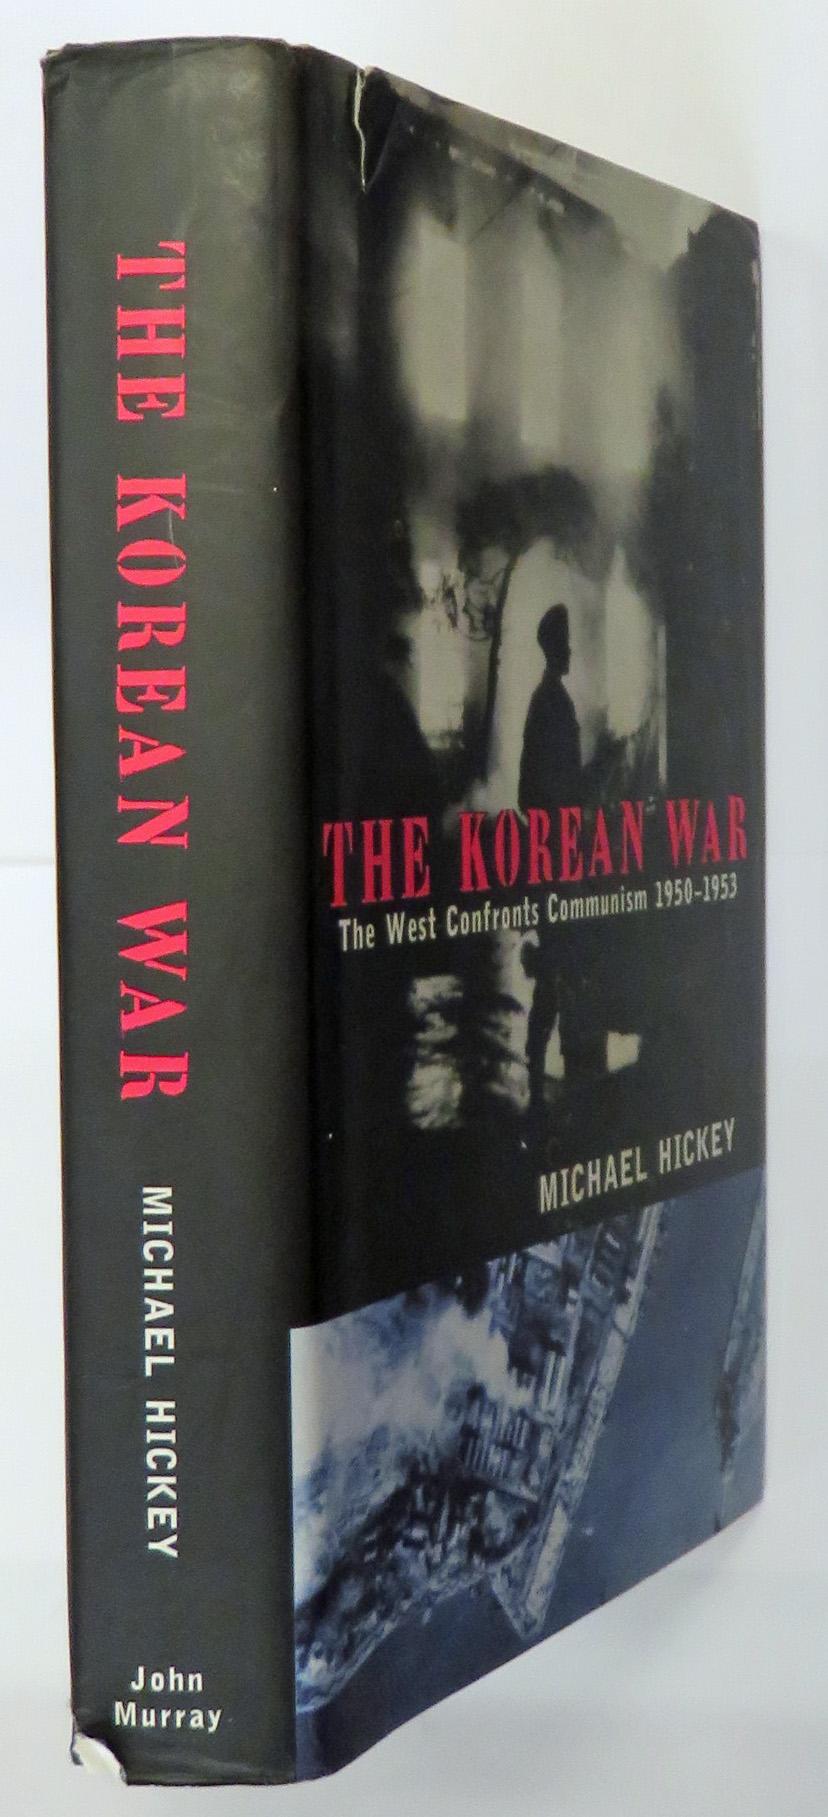 The Korean War The West Confronts Communism 1950-1953